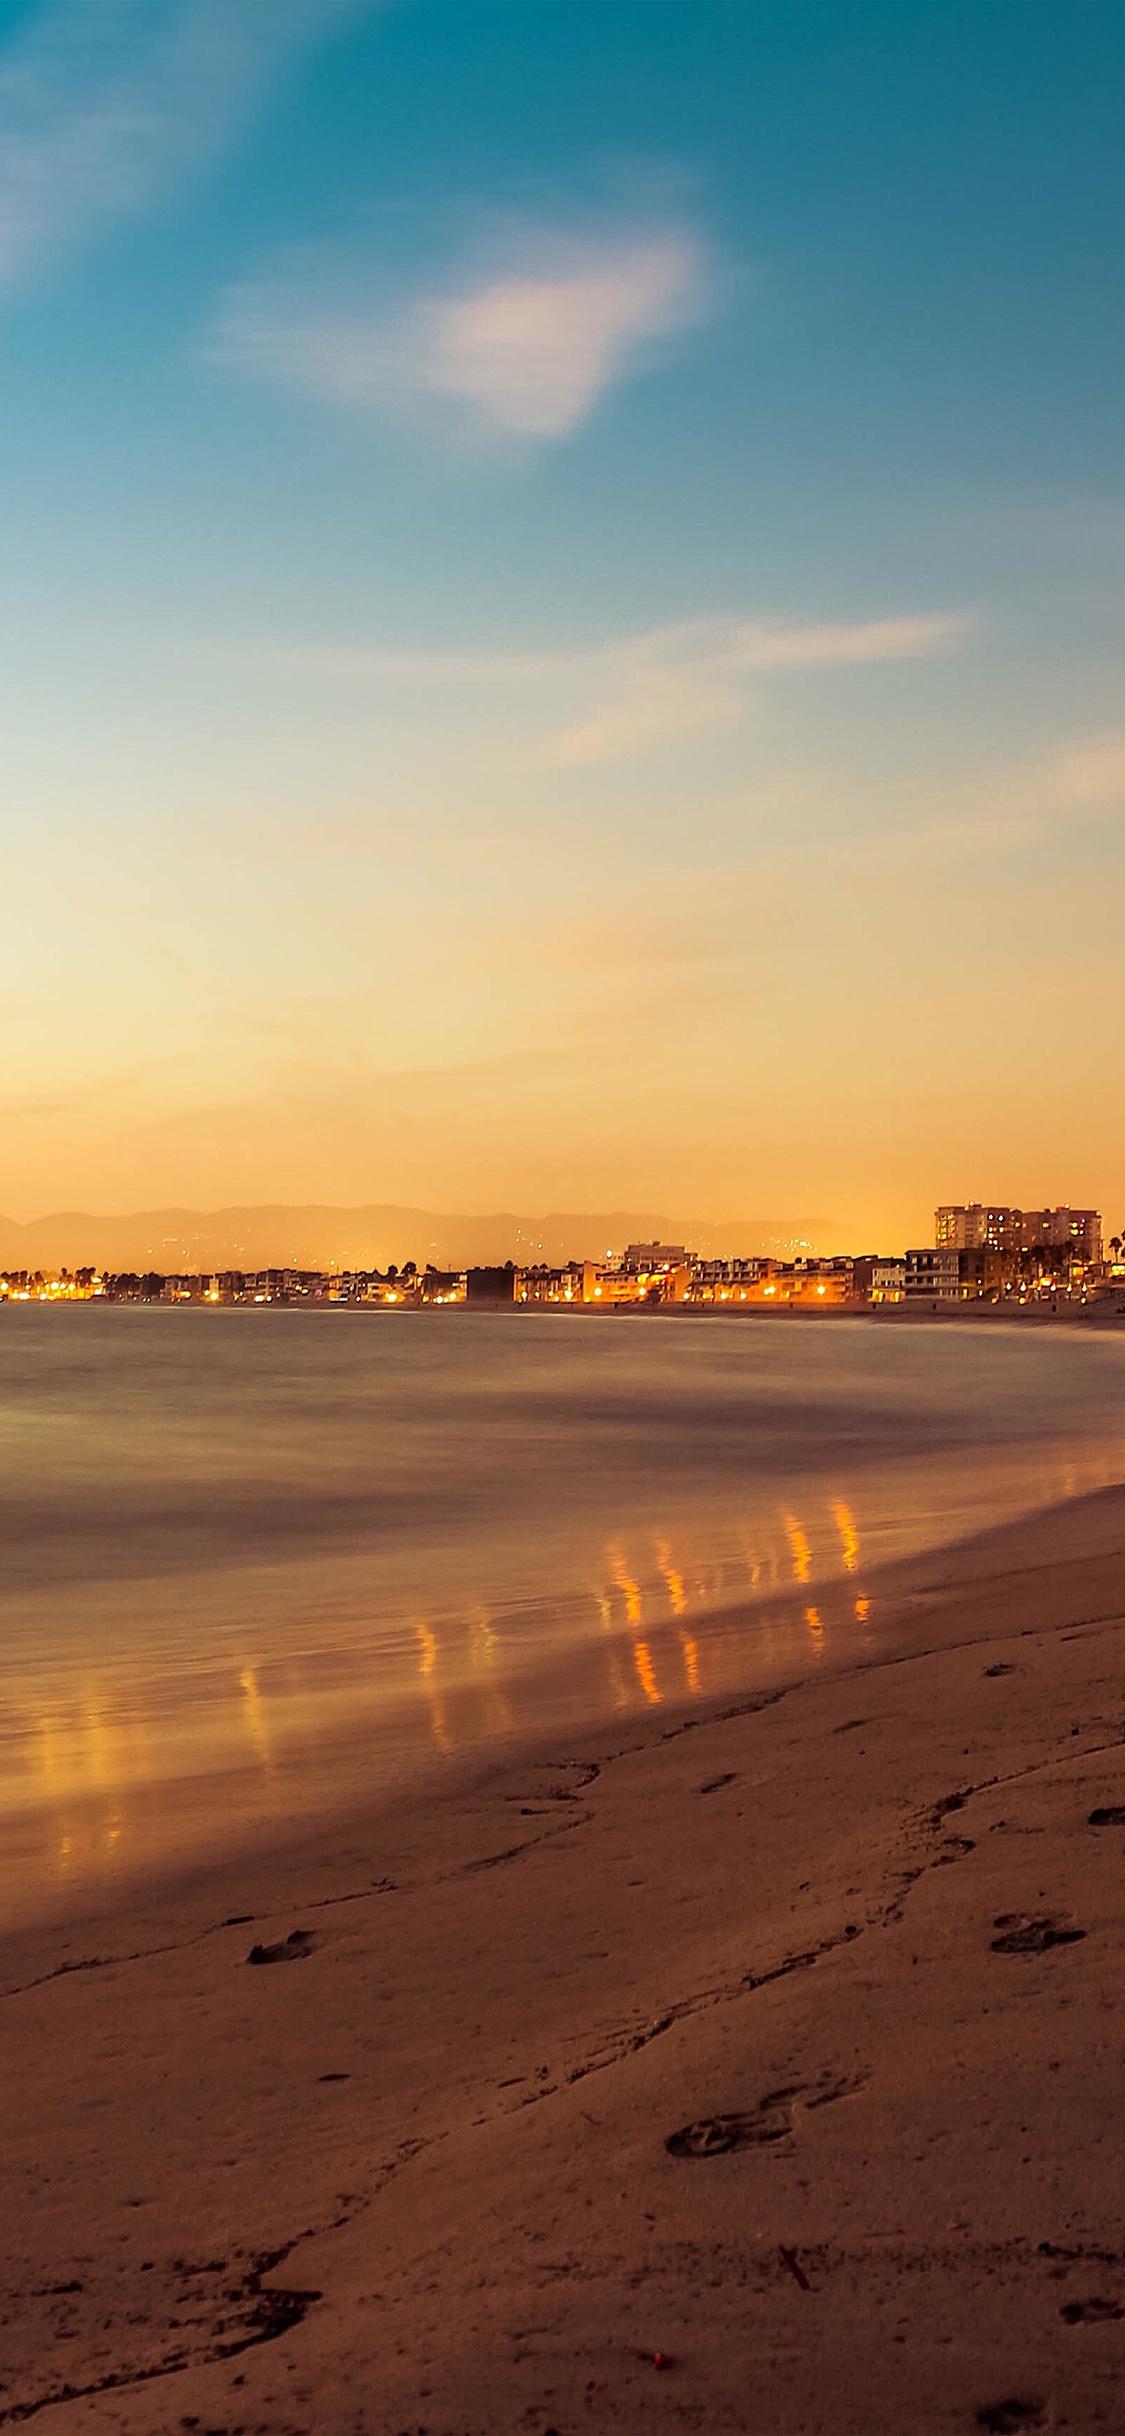 iphonexpapers | iphone x wallpaper | nf38-beach-summer-night